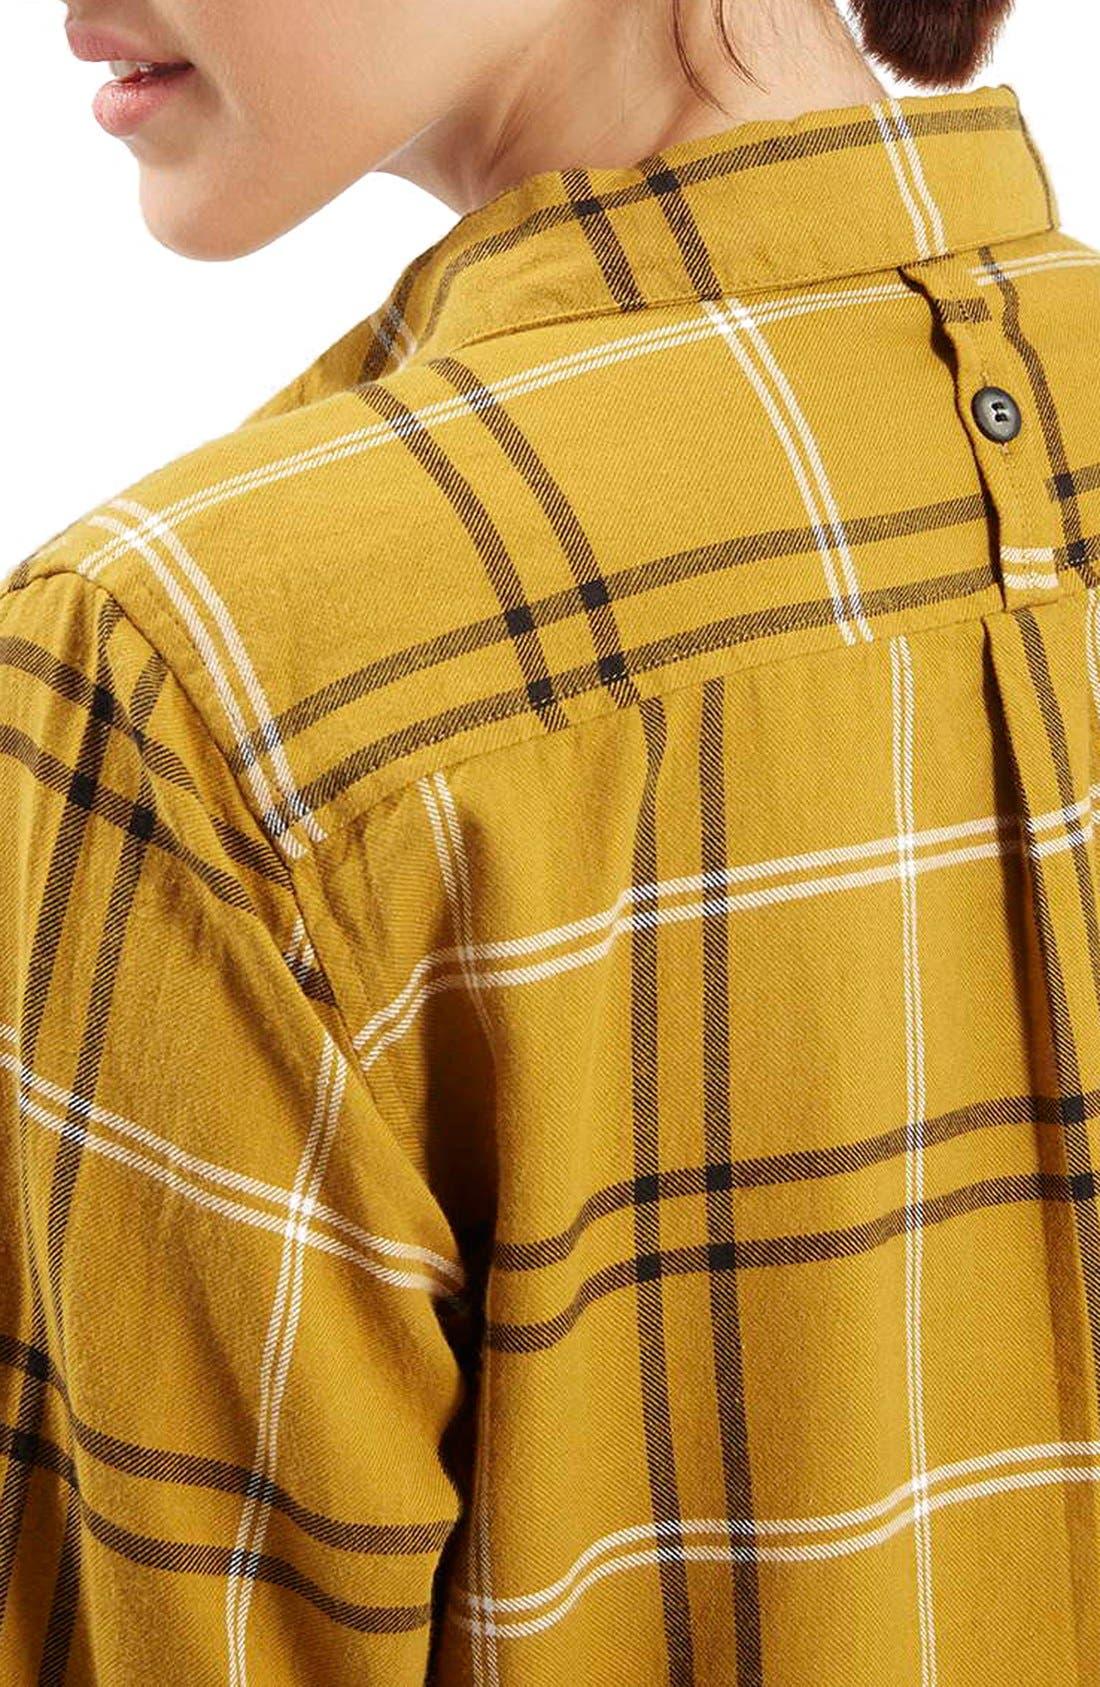 TOPSHOP, 'Billie' Check Button FrontBoyfriend Shirt, Alternate thumbnail 4, color, 701